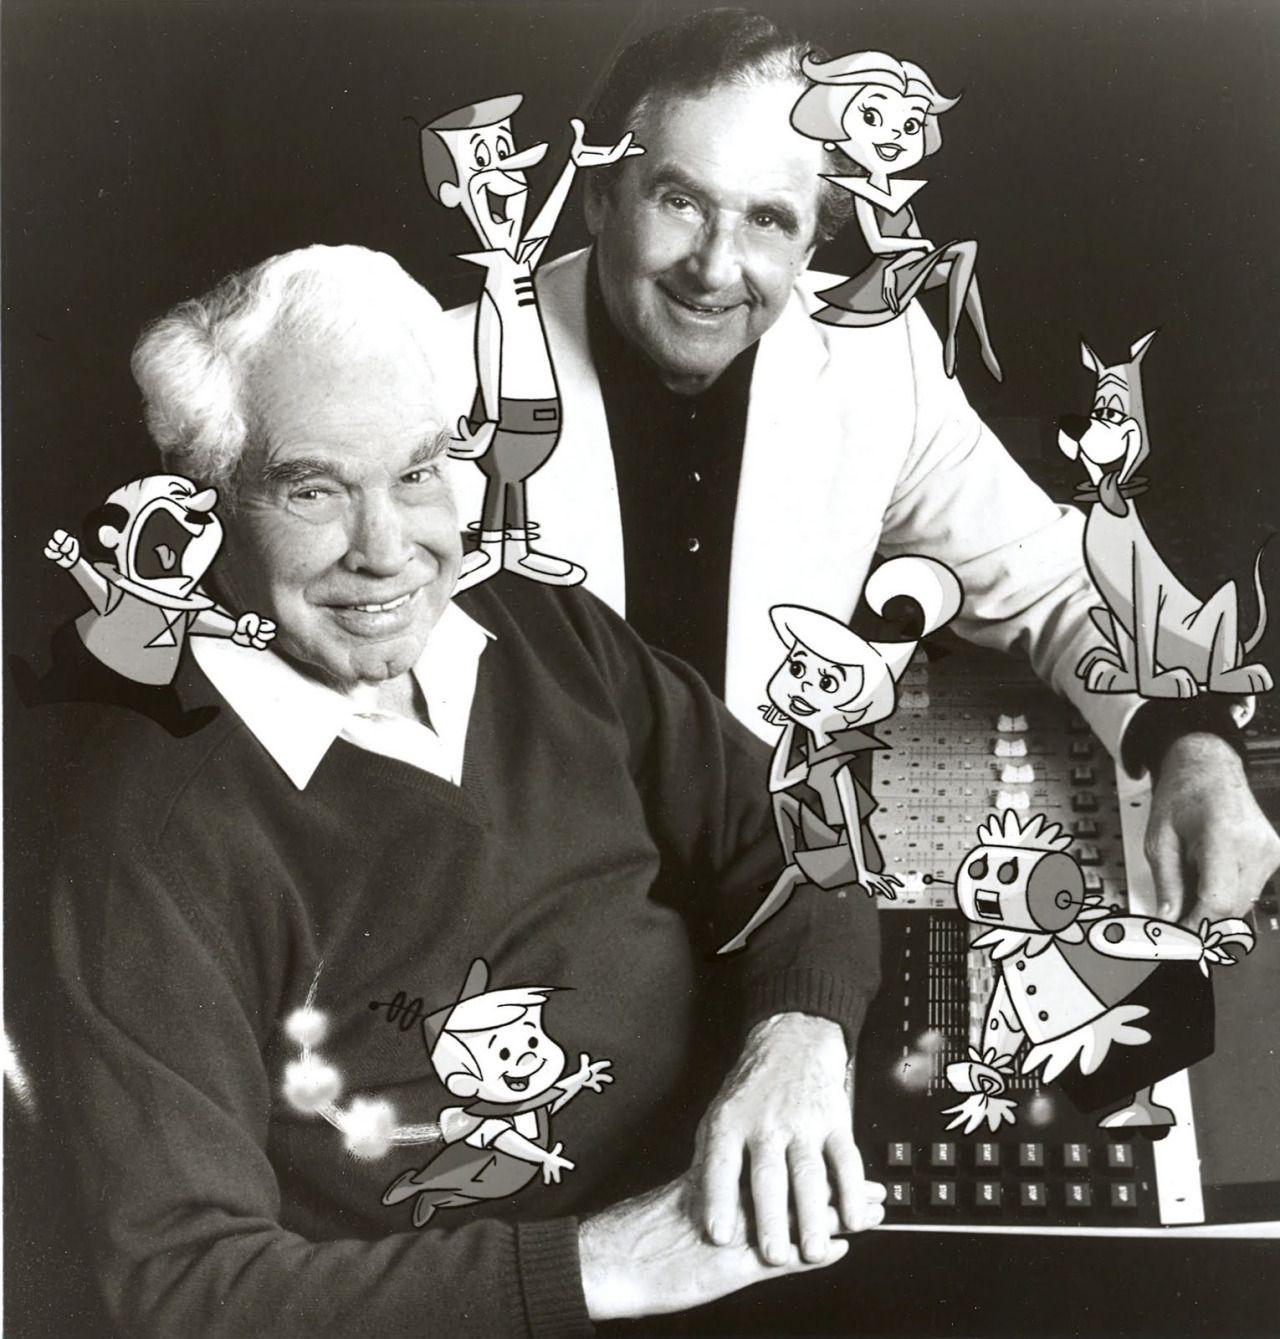 Hanna-Barbera The Jetsons